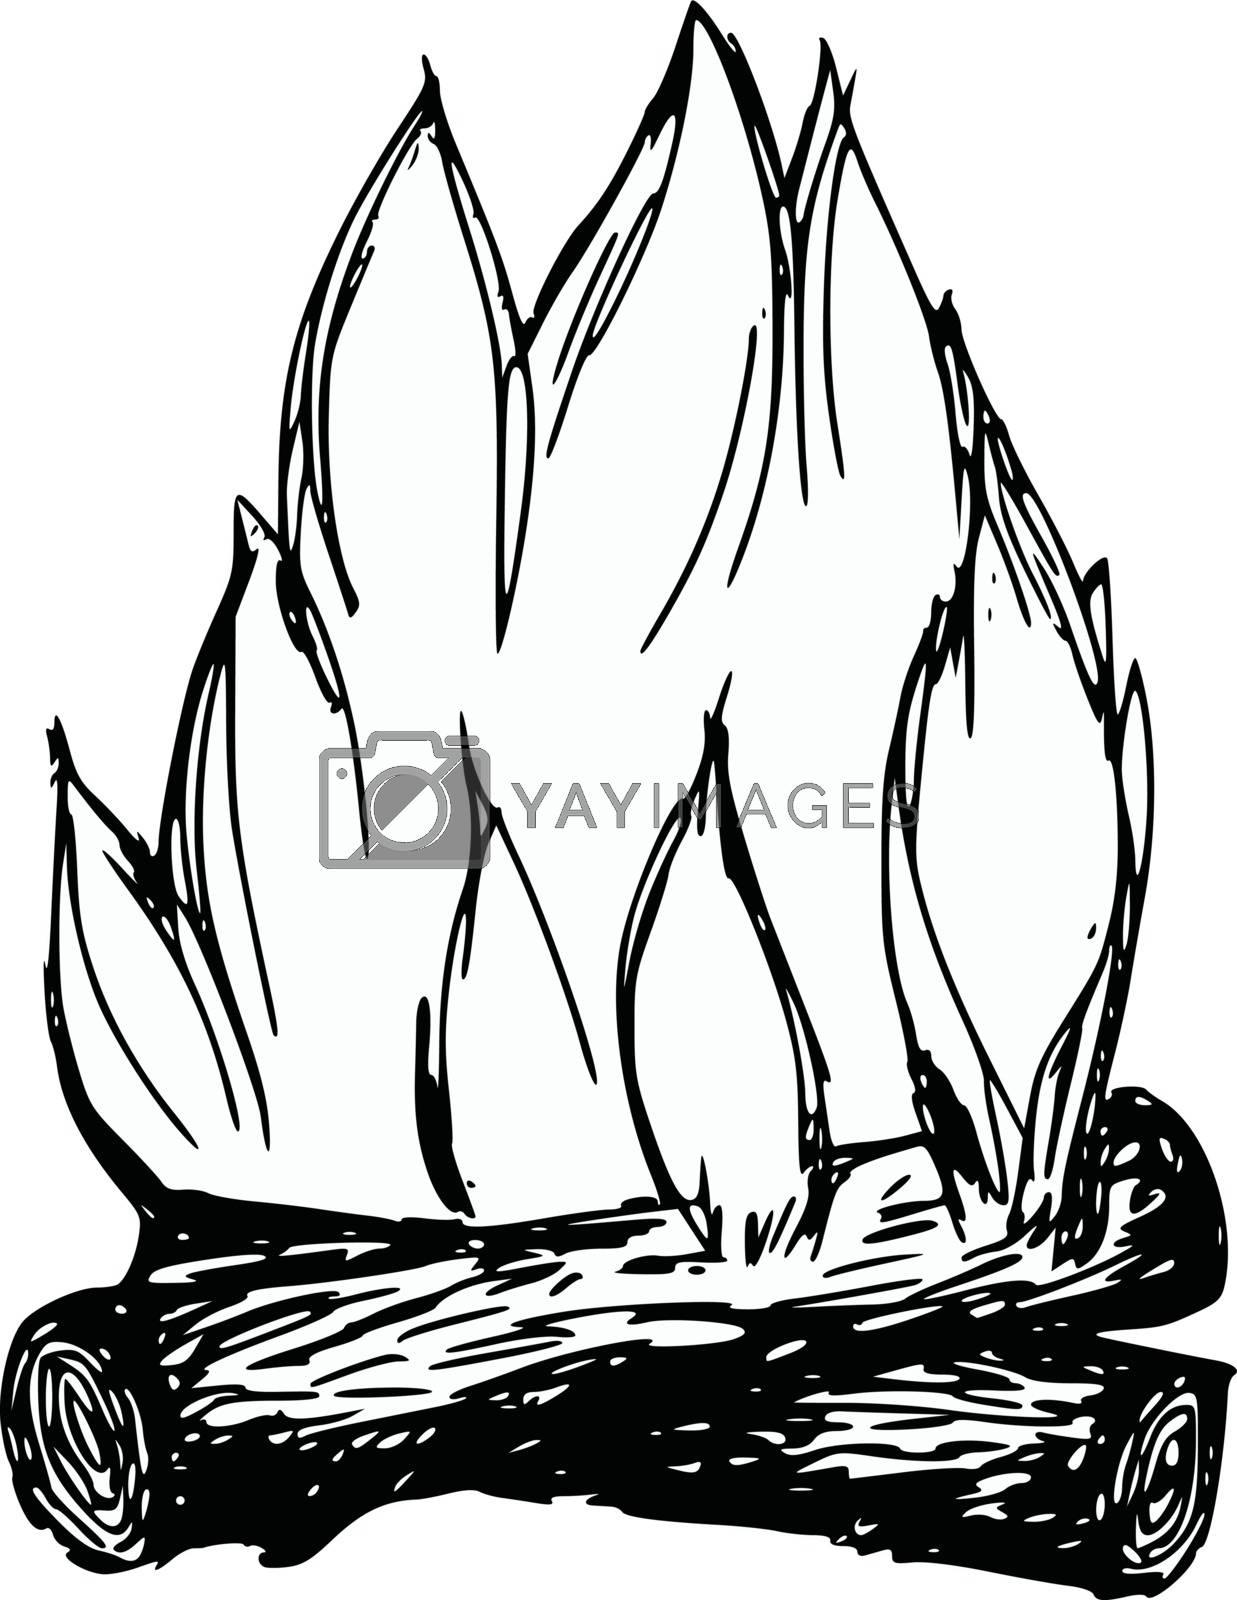 hand drawn, cartoon, sketch illustration of campfire